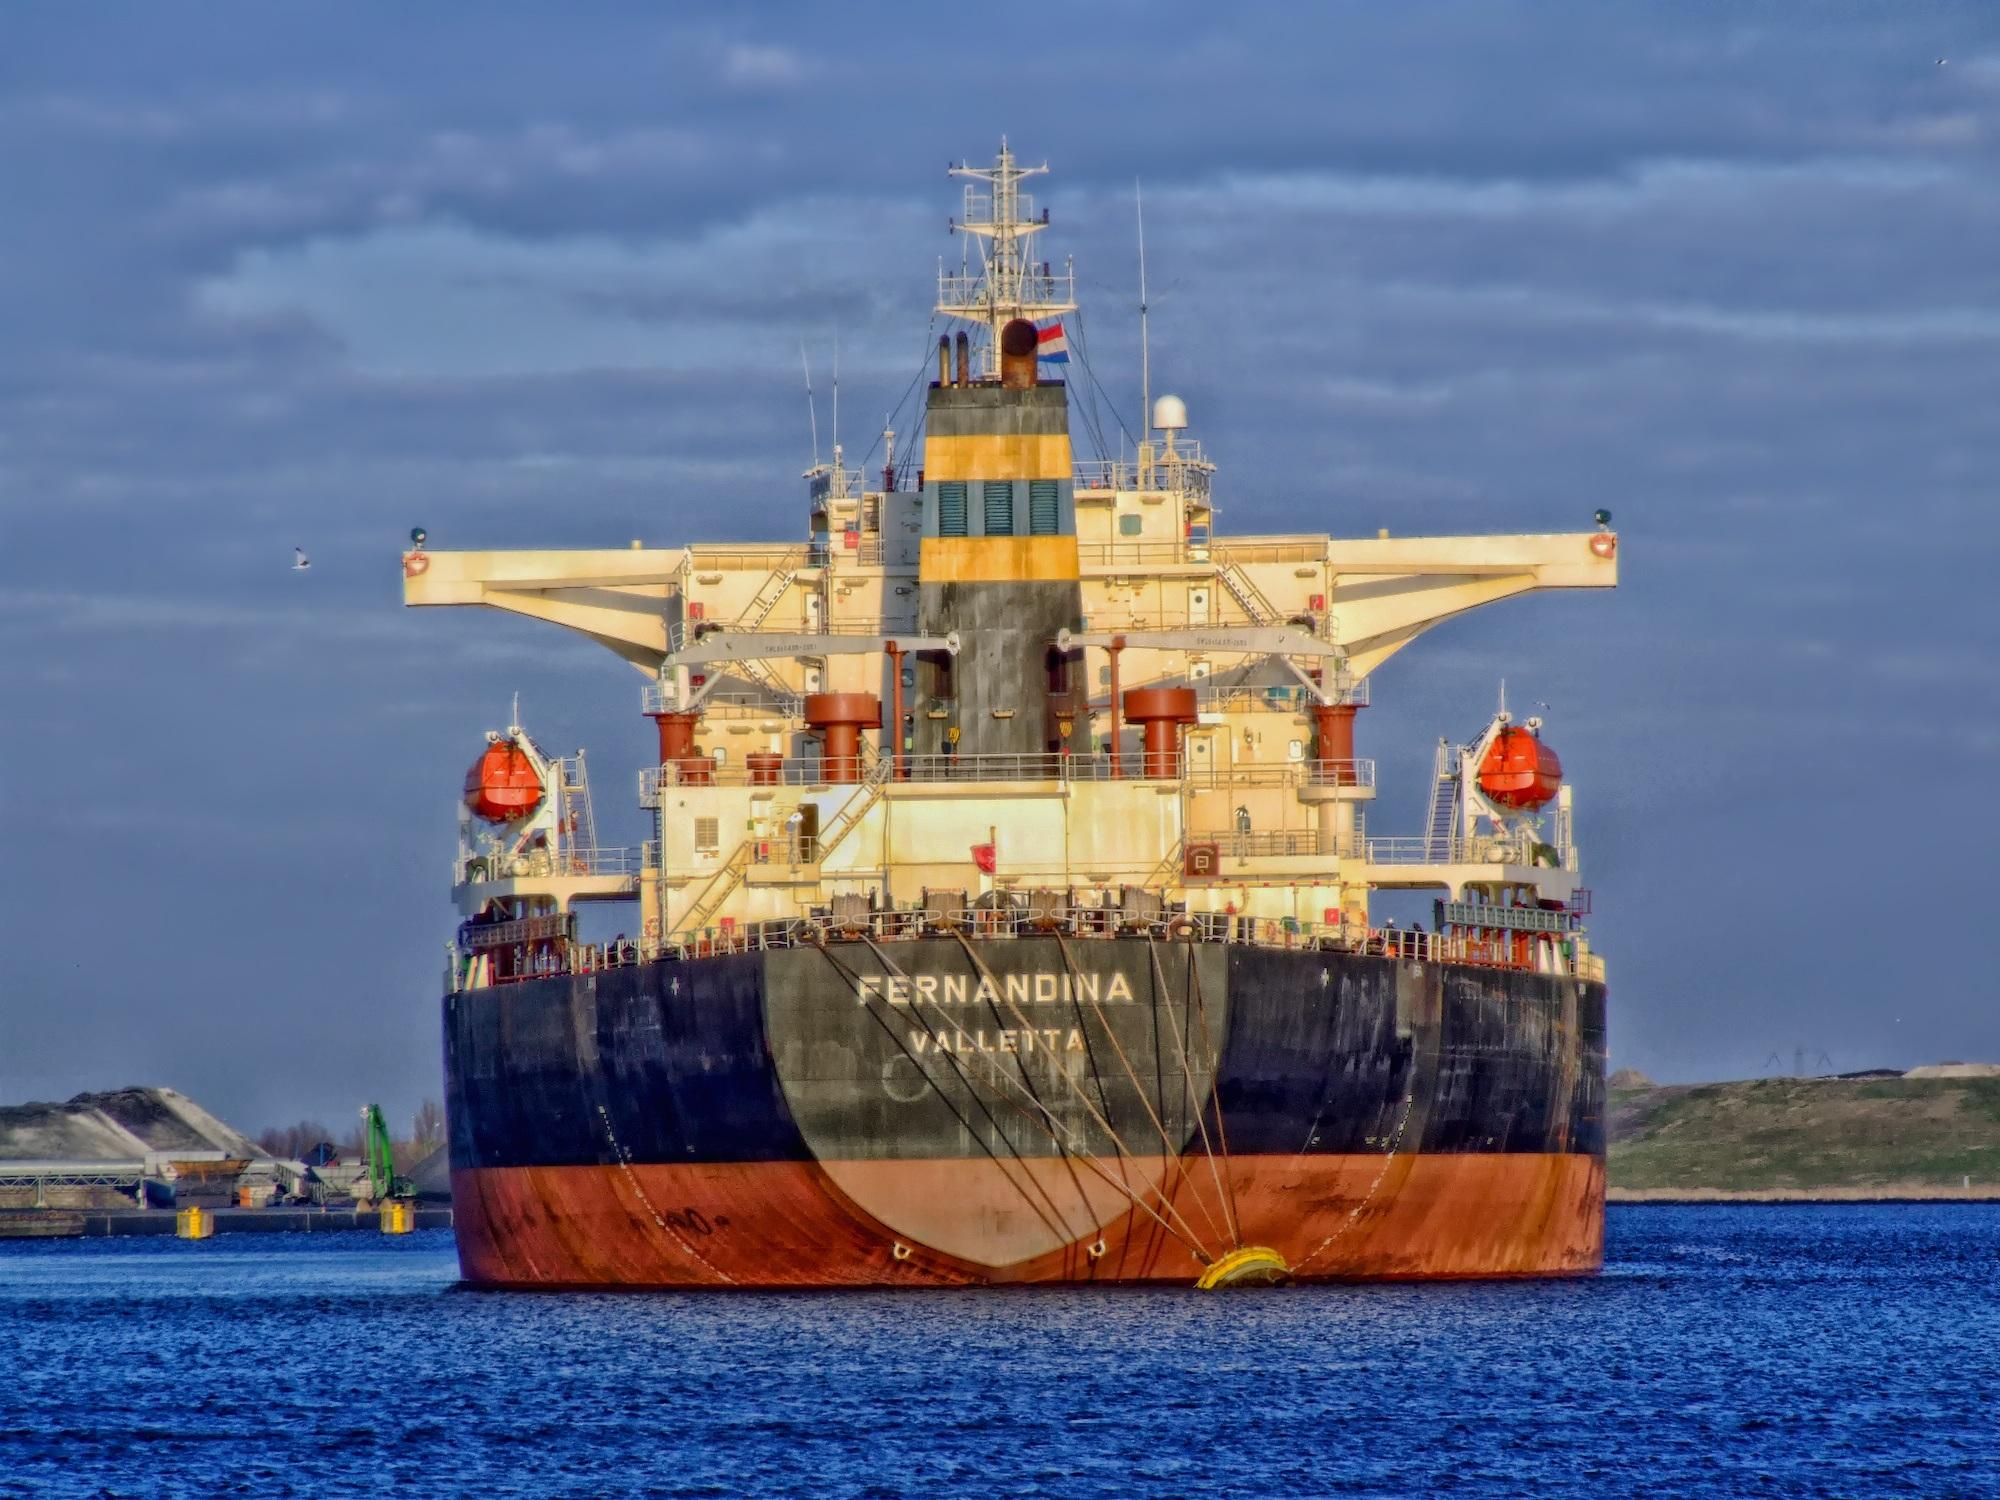 Ship performance monitoring